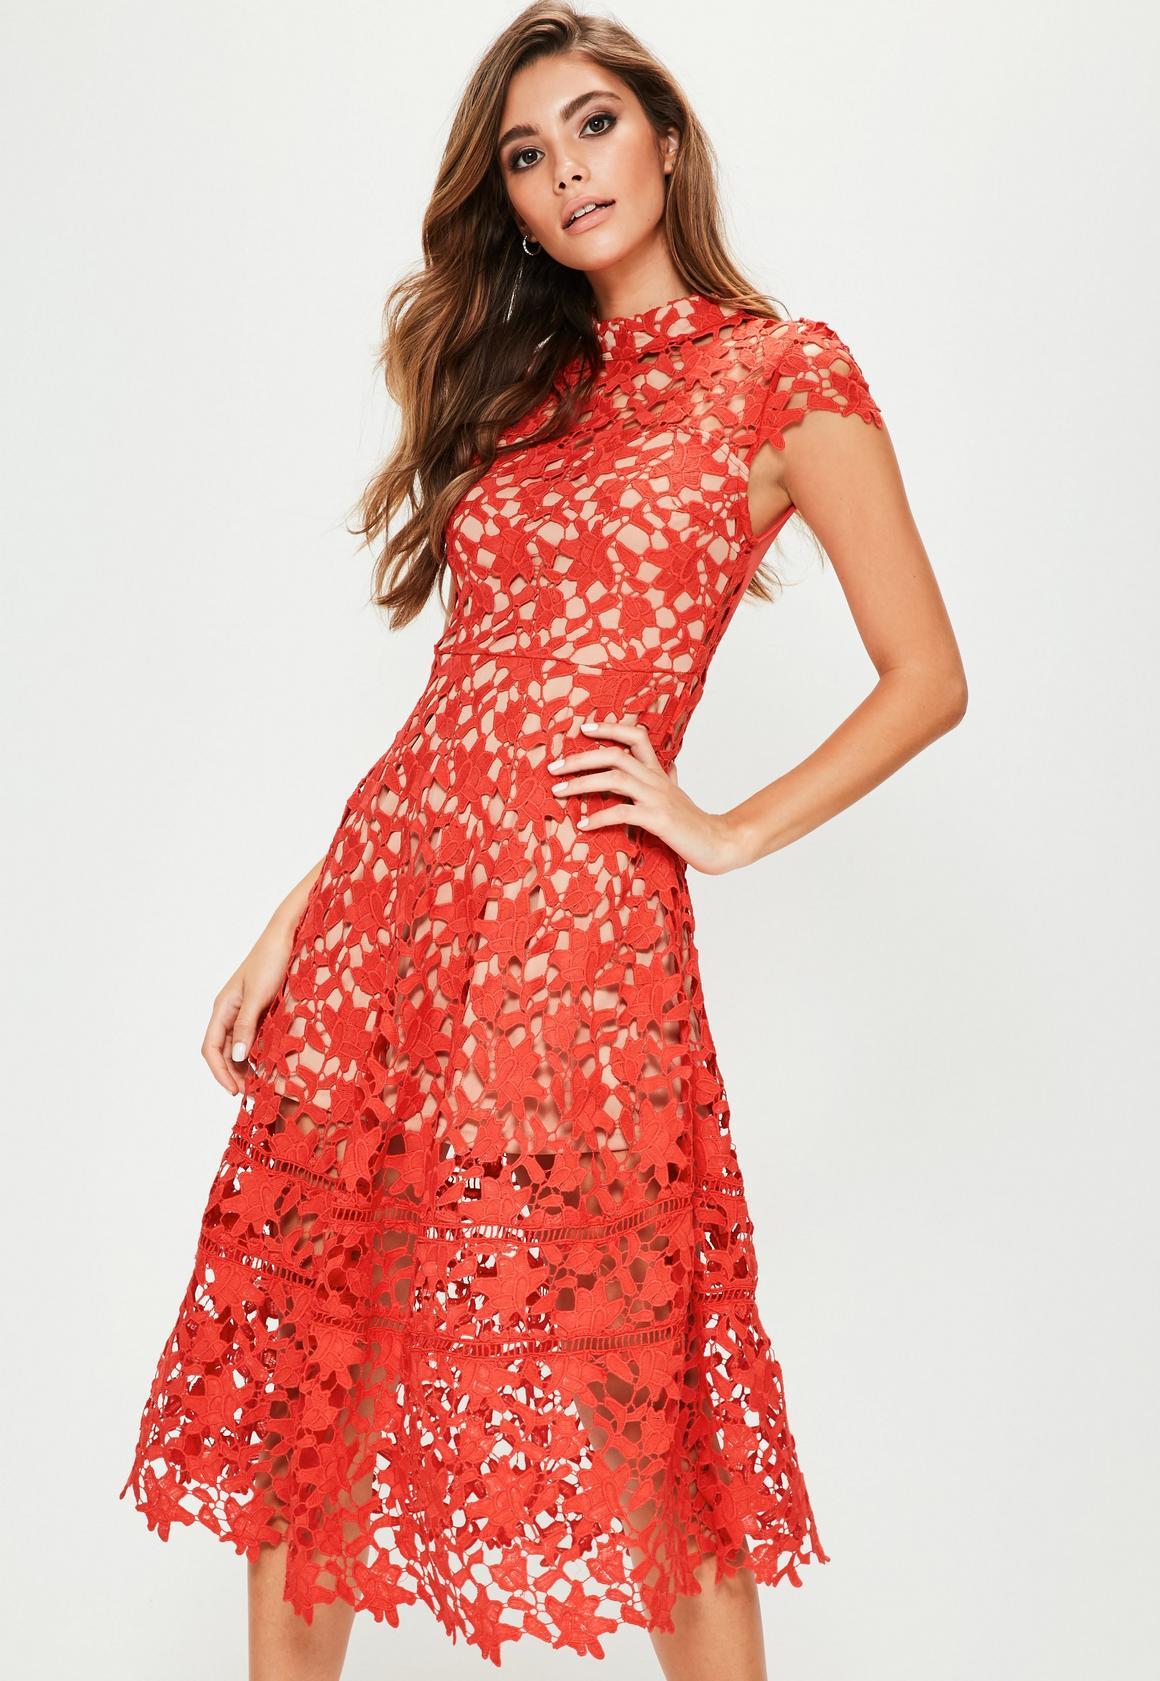 257da0e98f Ekstremalne Czerwona koronkowa rozkloszowana sukienka midi